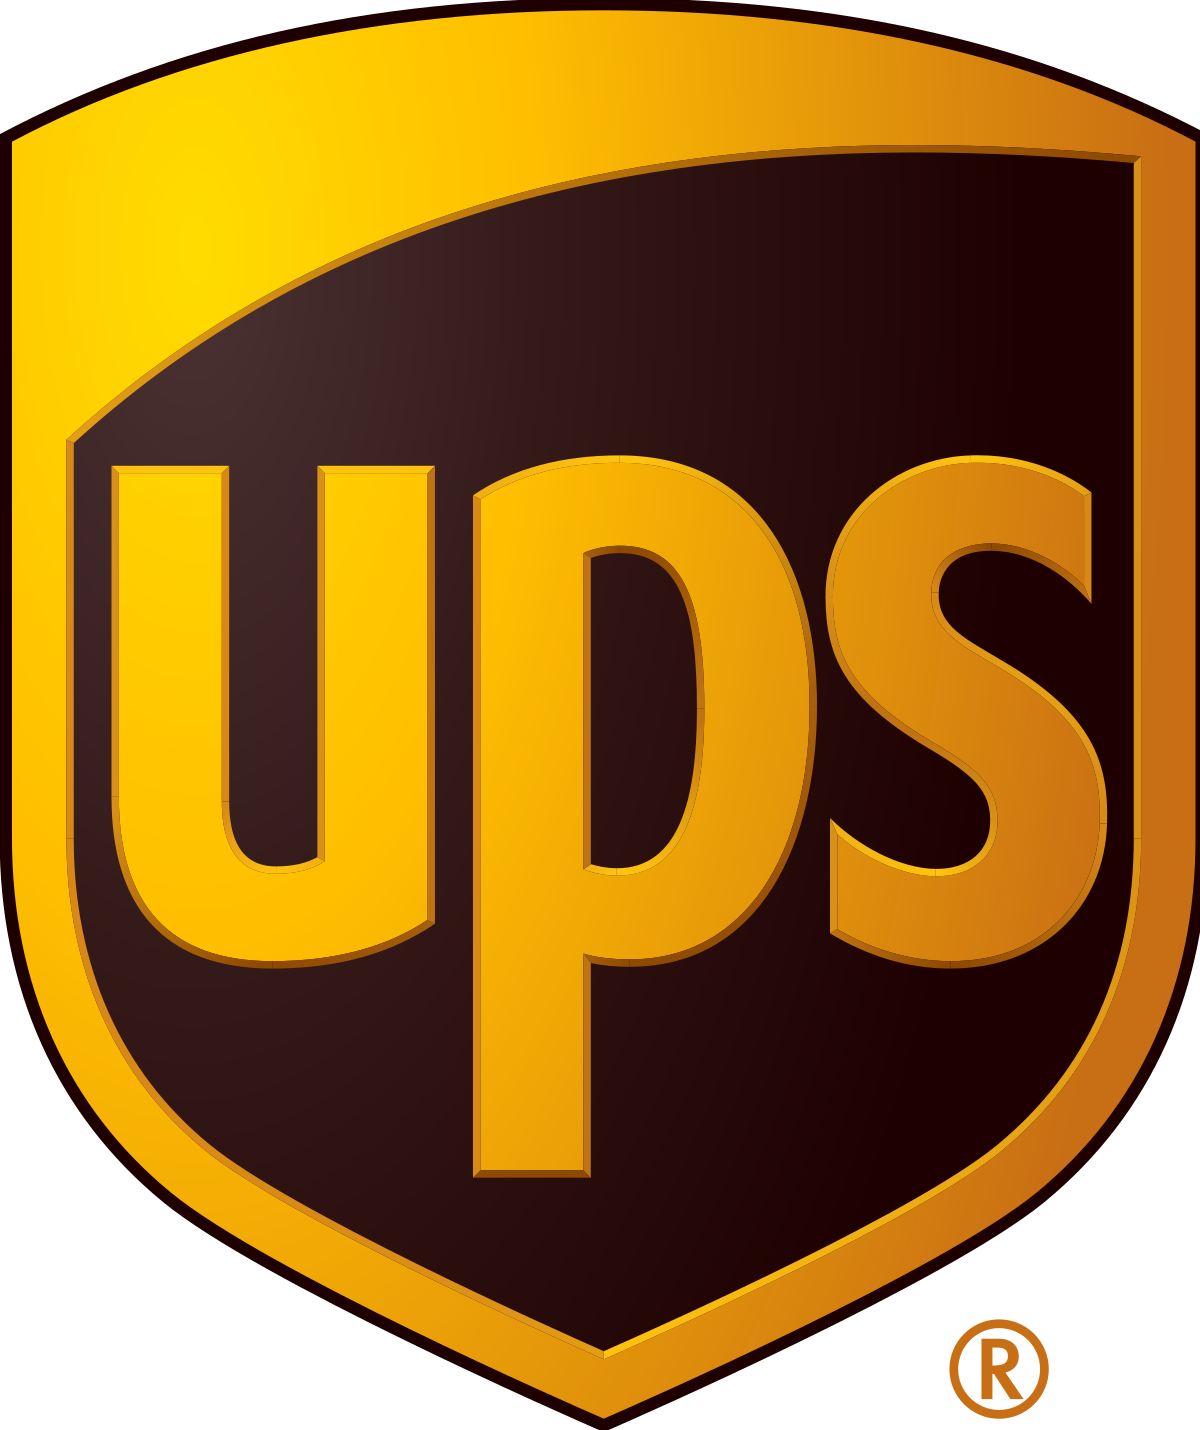 United Parcel Service.